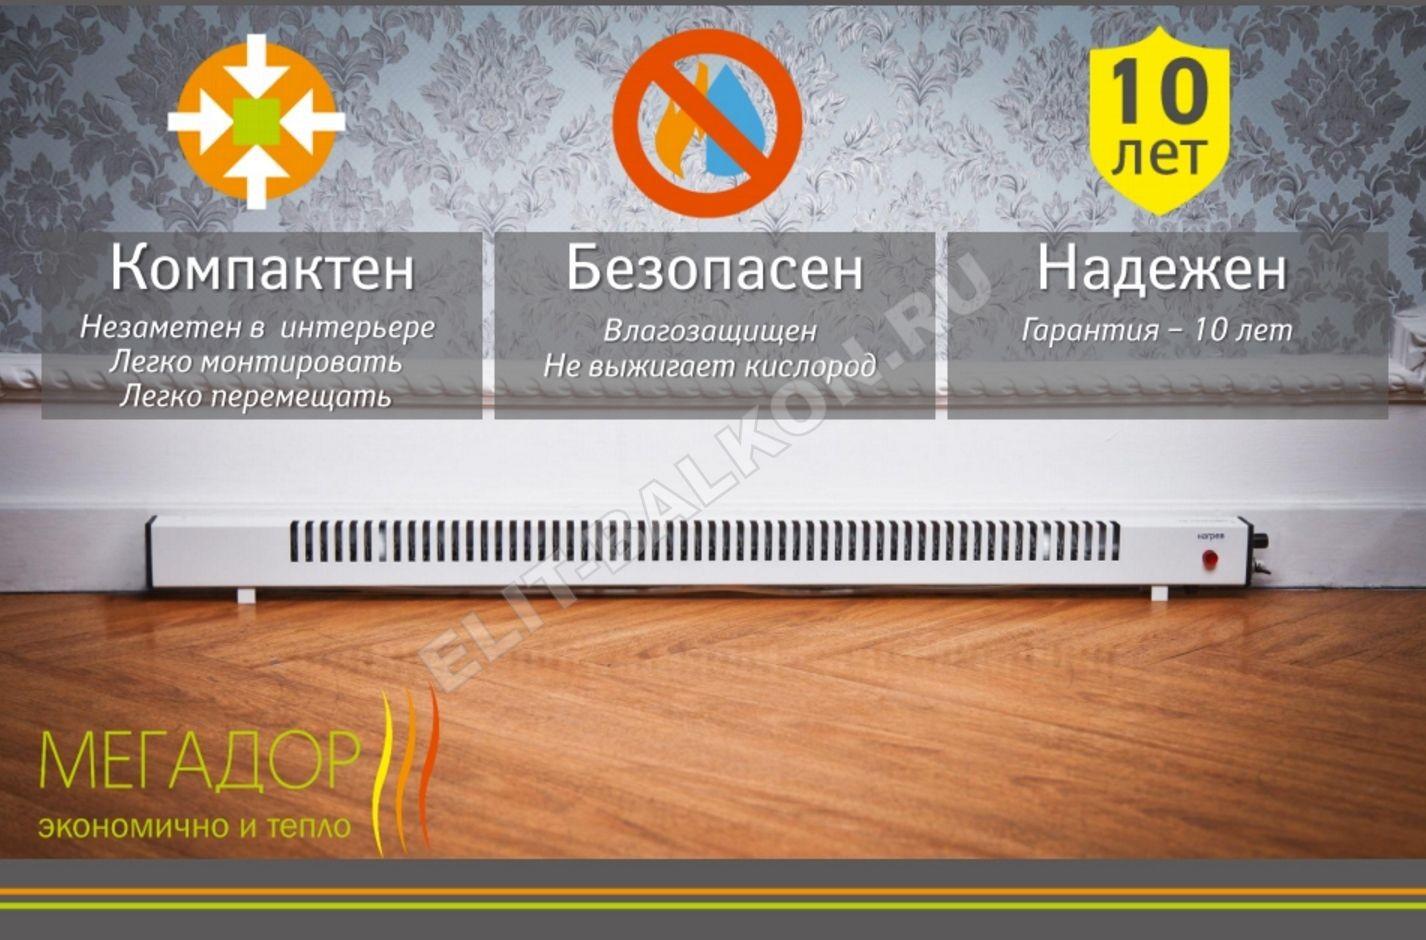 1 Obogrevatel plintusnyj elektricheskij MEGADOR Lajt MF Lajt 100 1500 2000 - Мегадор Лайт - обогреватель на балкон